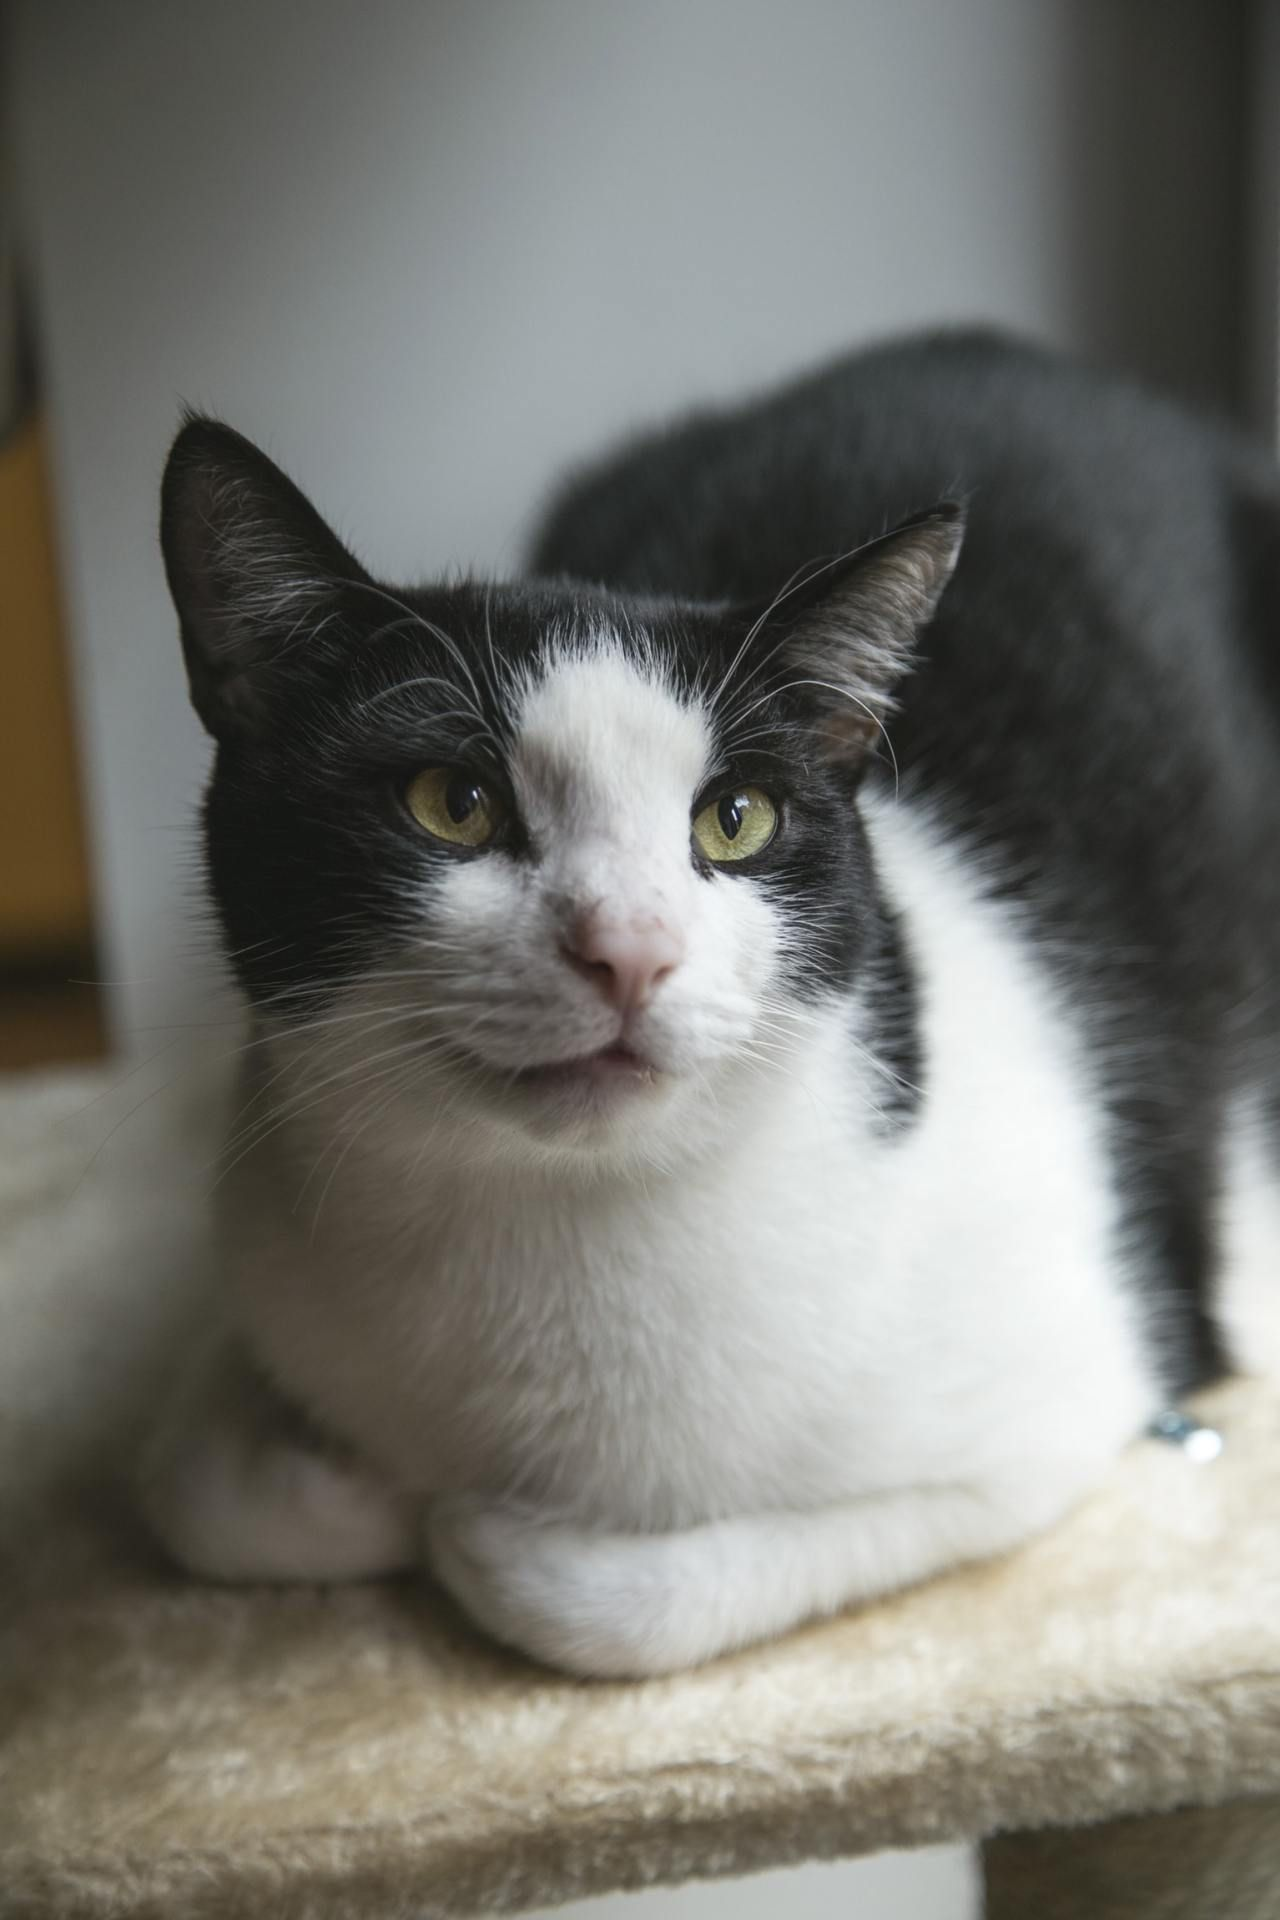 Cats Cat Kitten Cute Kitty In 2020 Fluffy Cat Breeds Fluffy